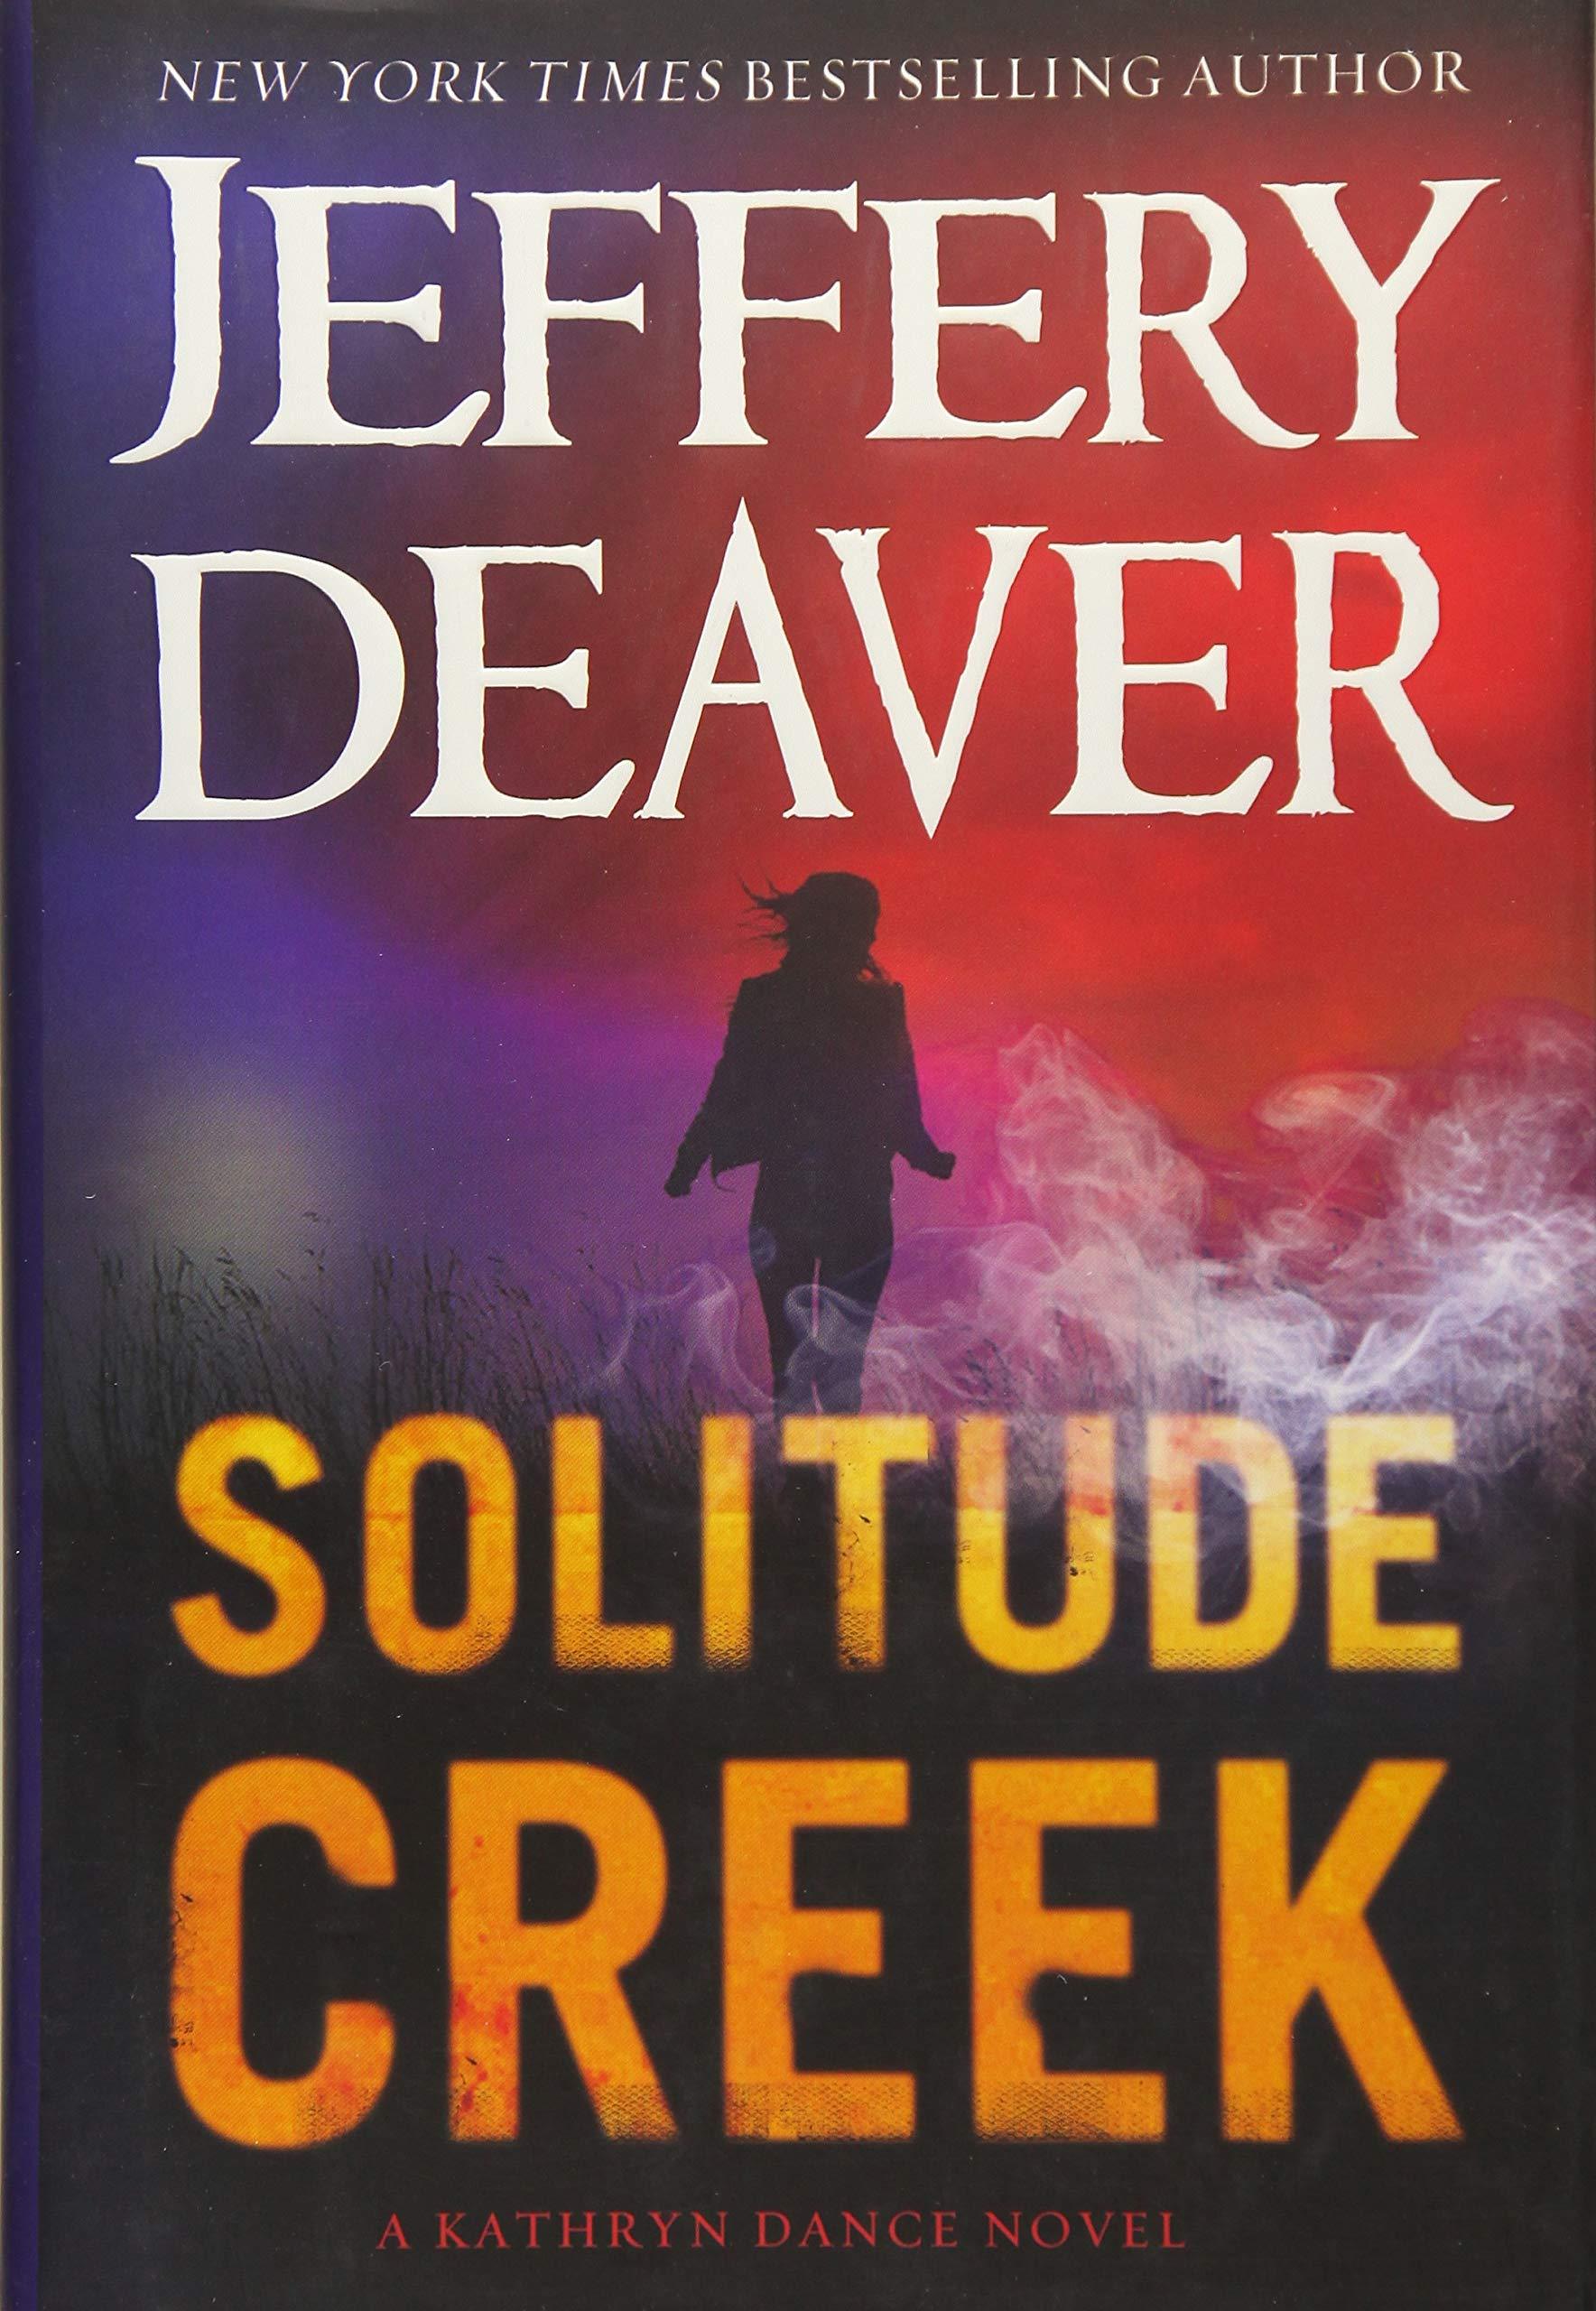 Amazon.com: Solitude Creek (A Kathryn Dance Novel) (9781455517152): Jeffery  Deaver: Books